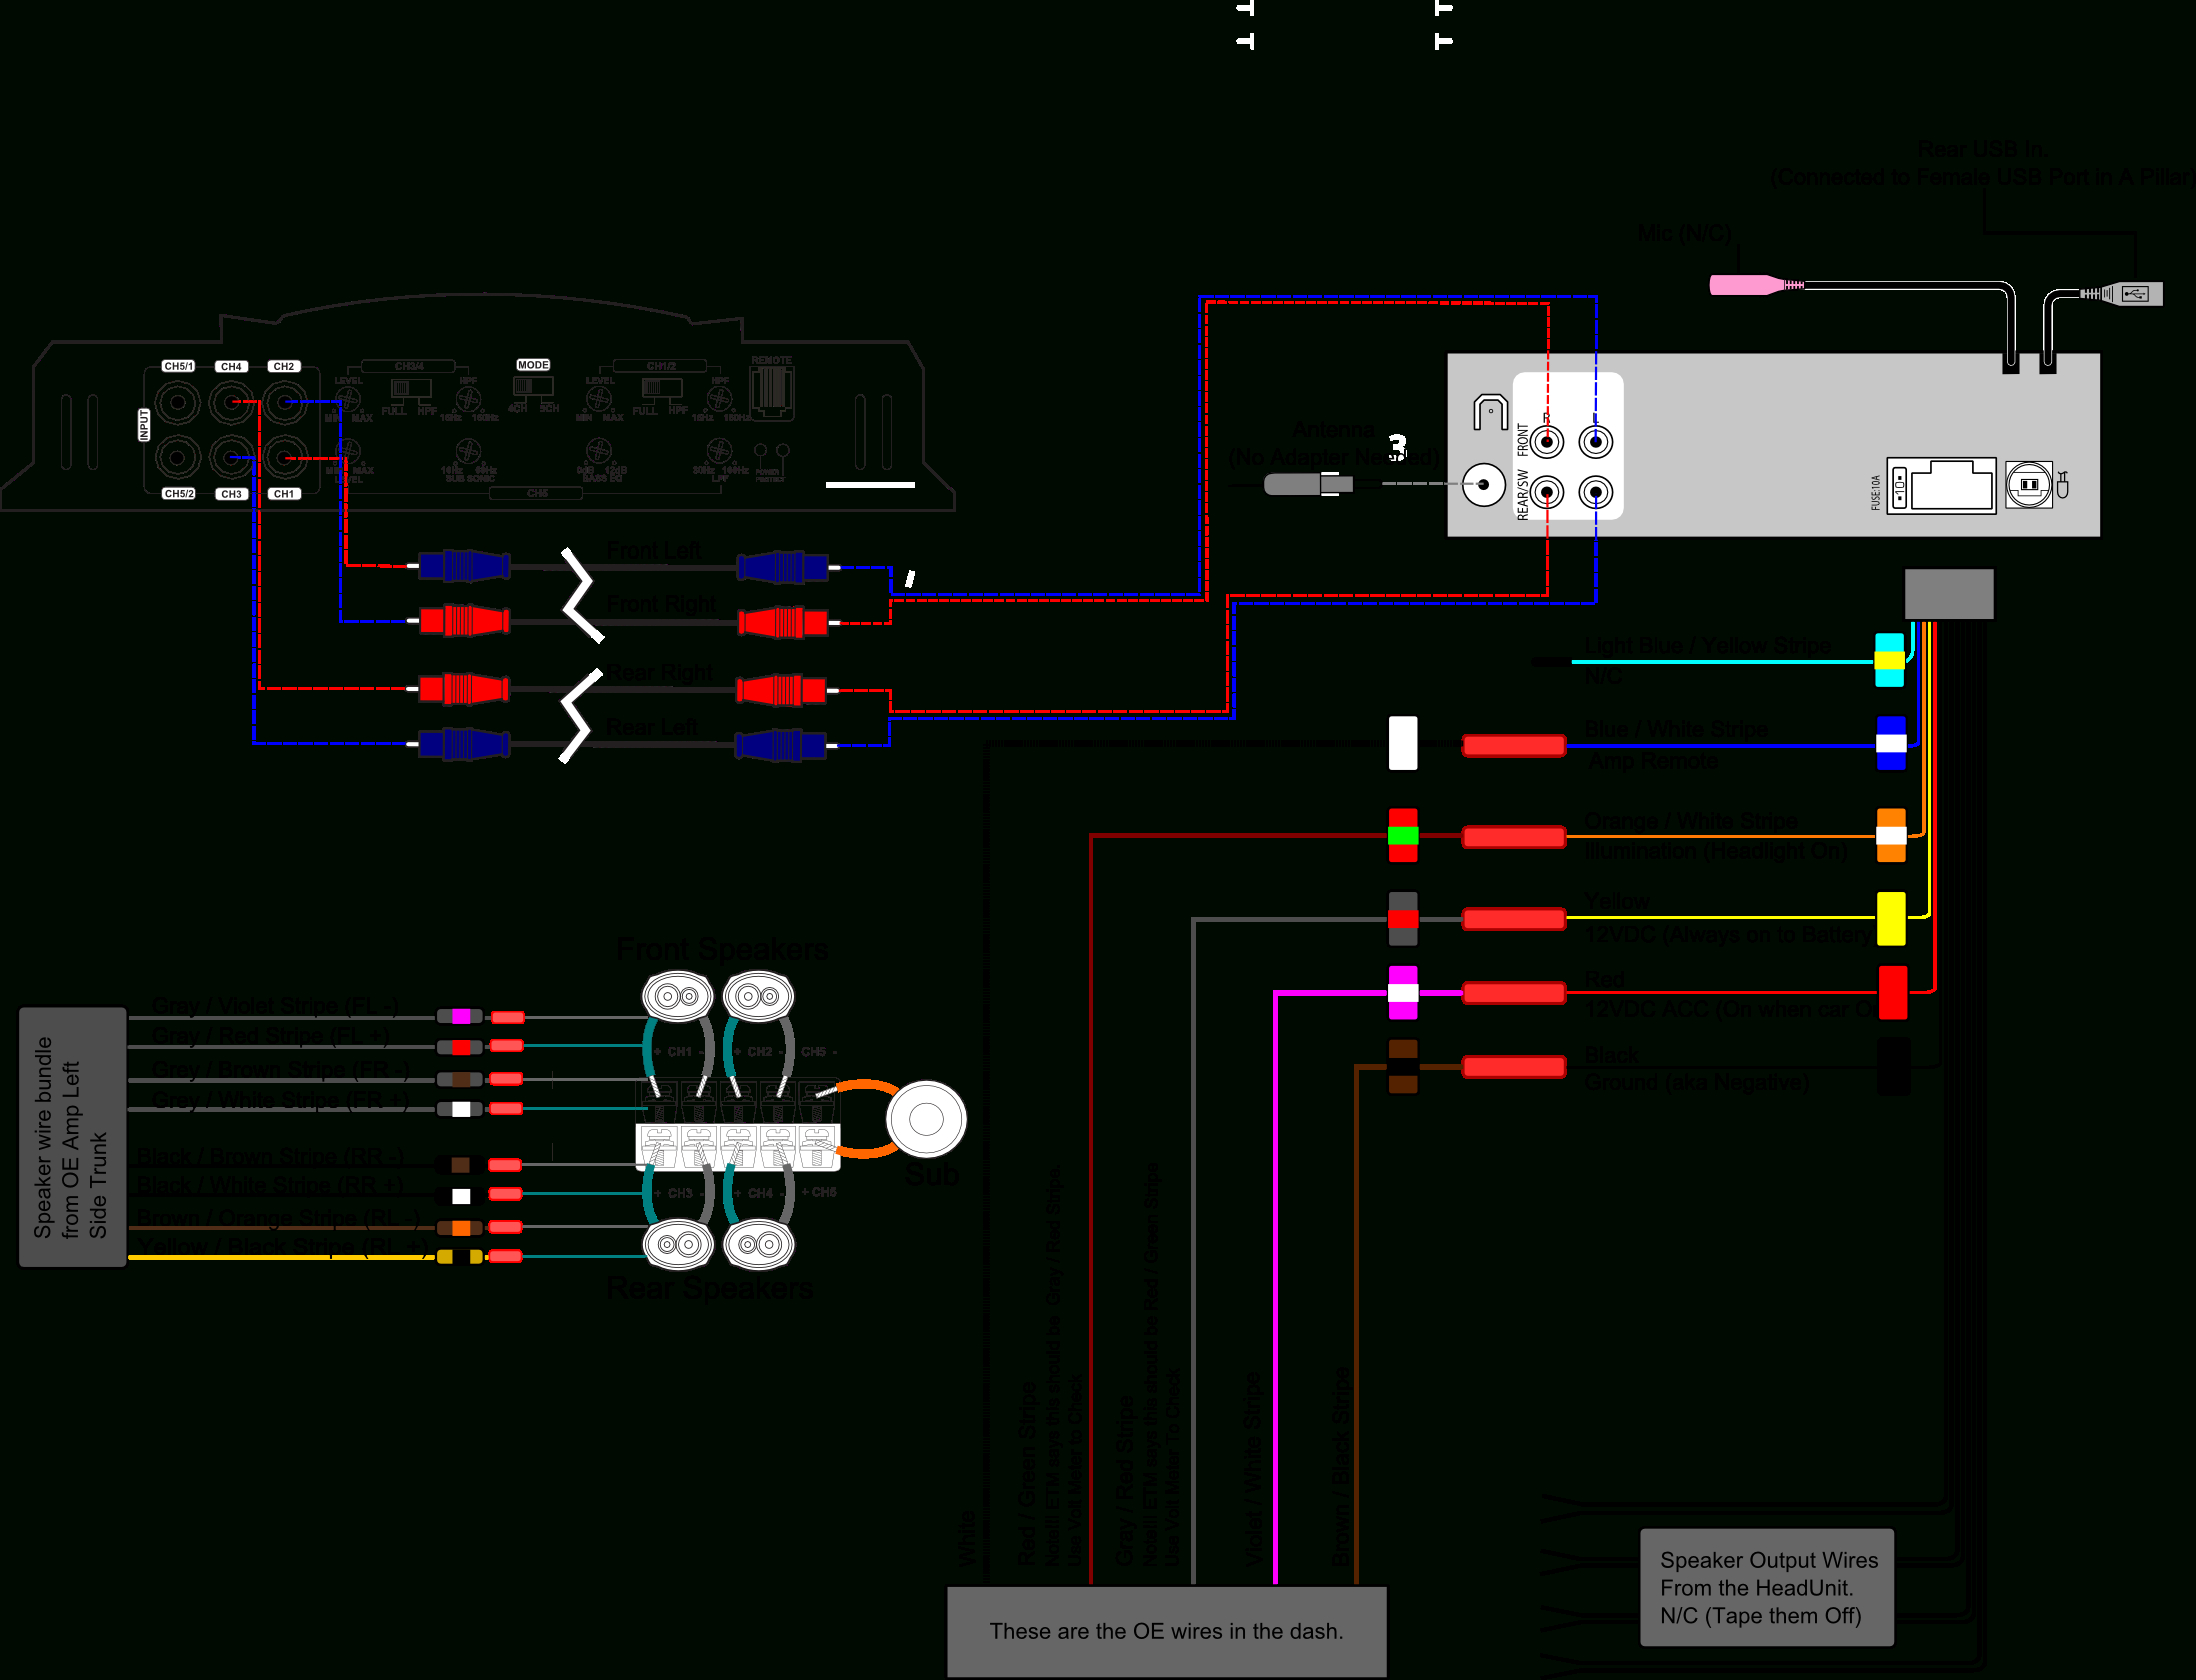 Dual Radio Wiring Diagram - Allove - Dual Radio Wiring Diagram